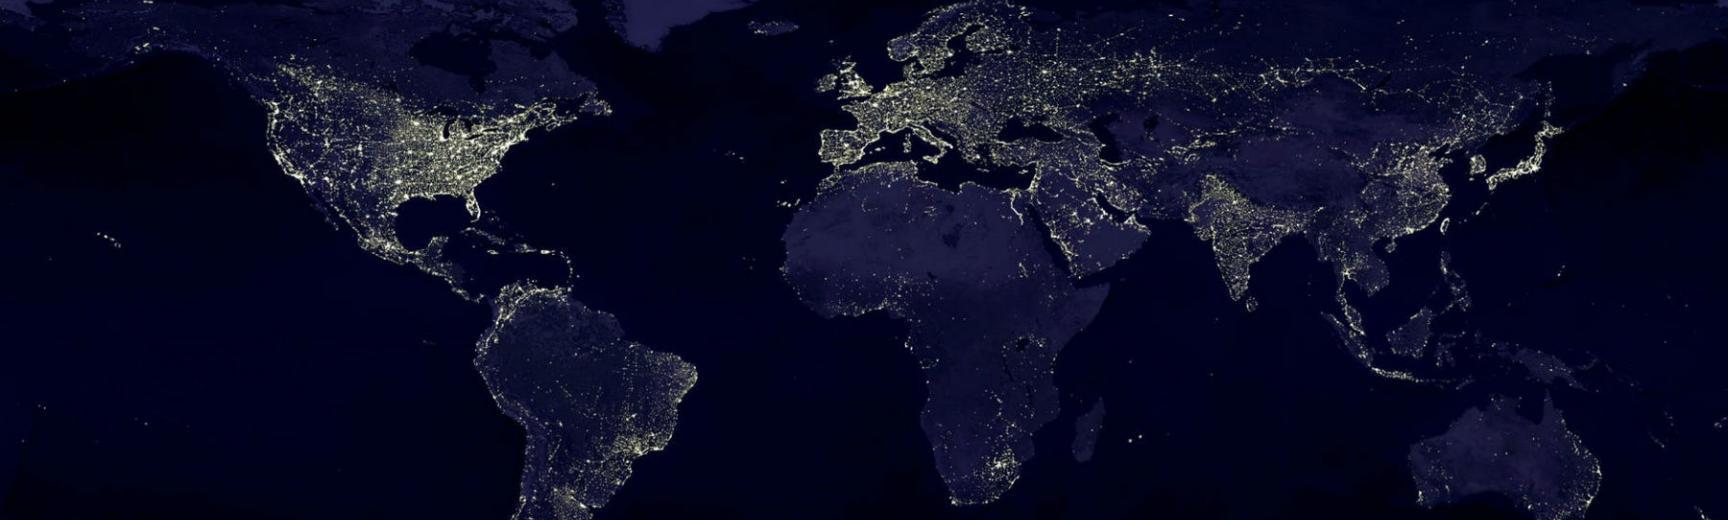 earth earth at night night lights 41949 pexels2